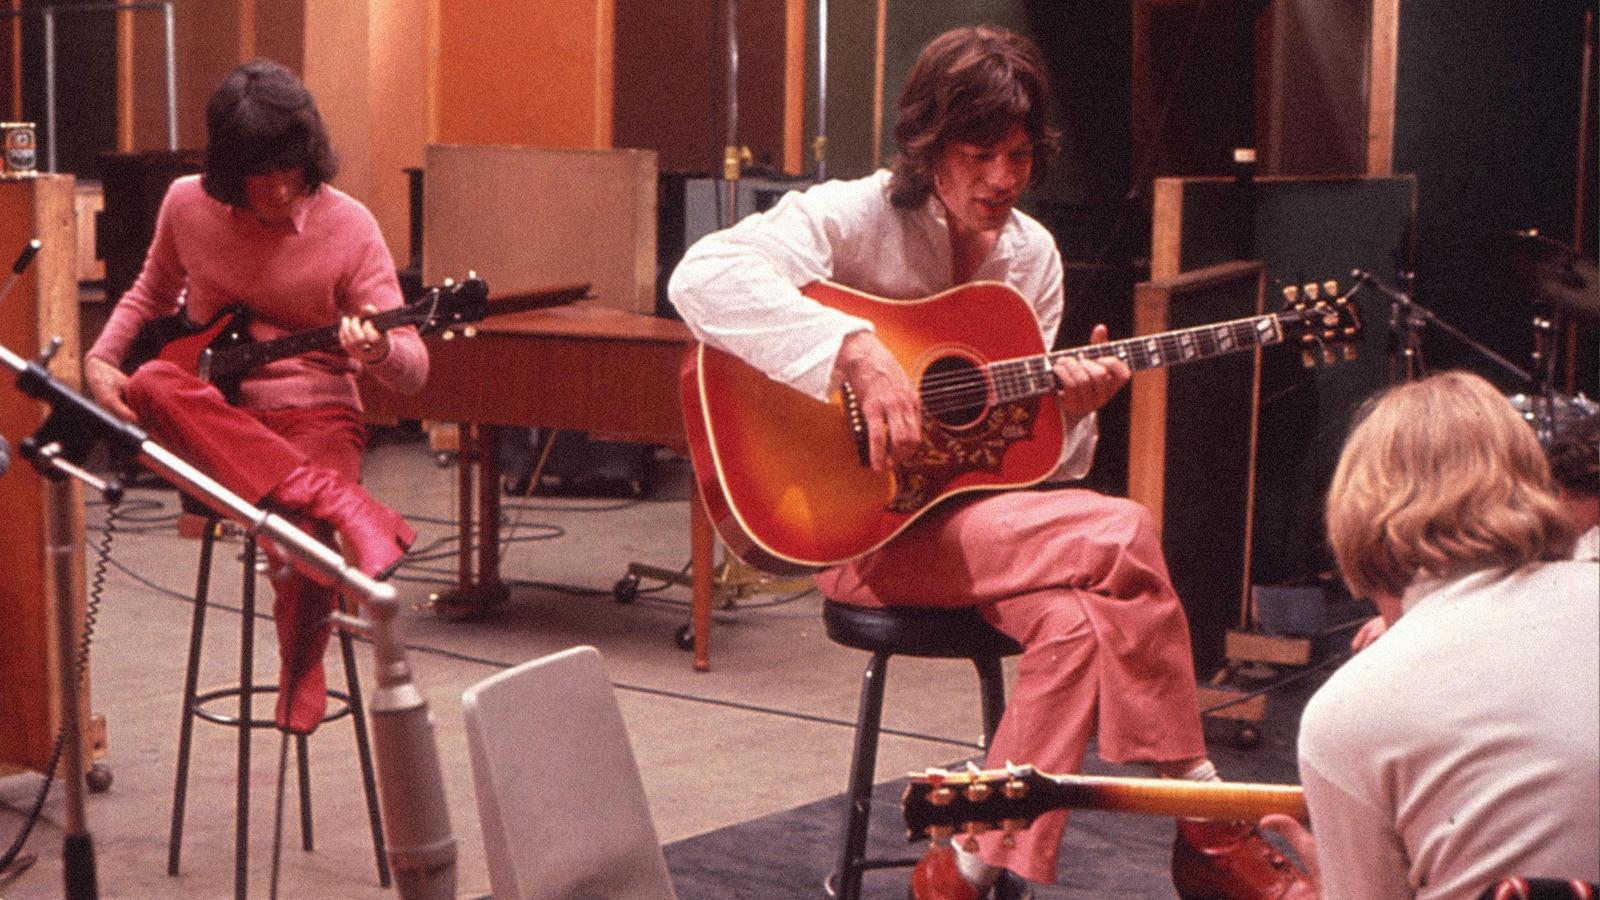 sympathy-for-the-devil-1968